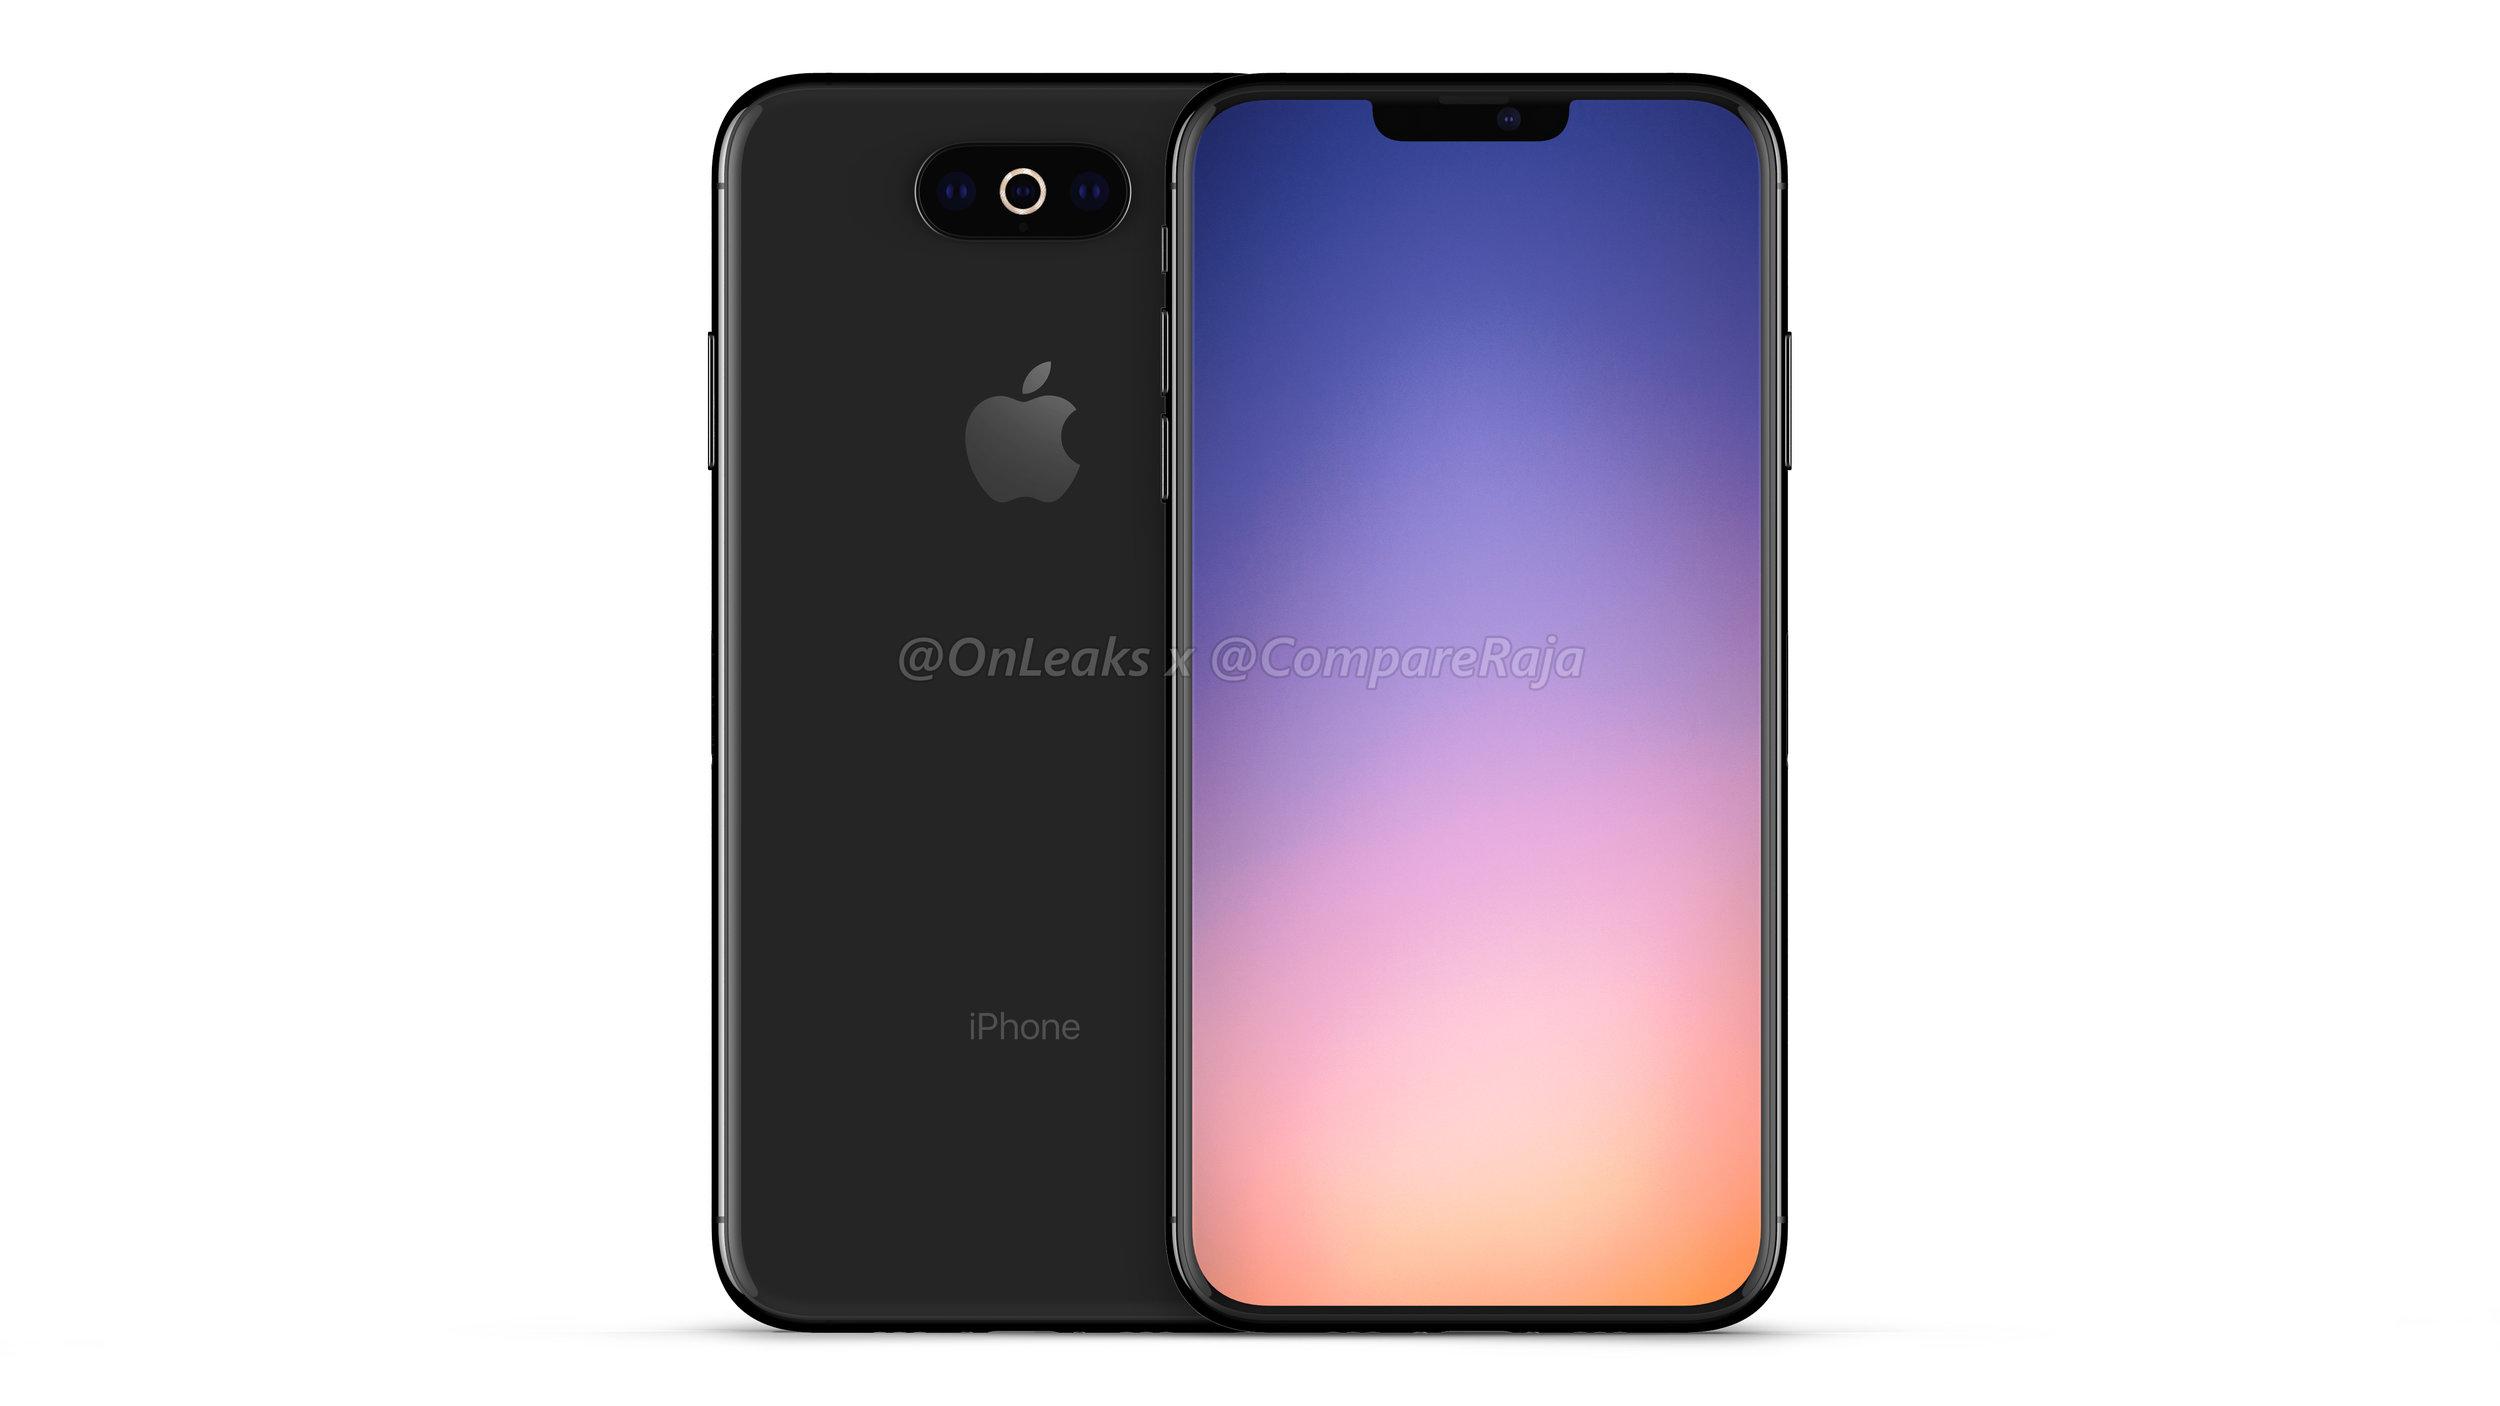 iphone-xi-2019-compareraja-1.jpg